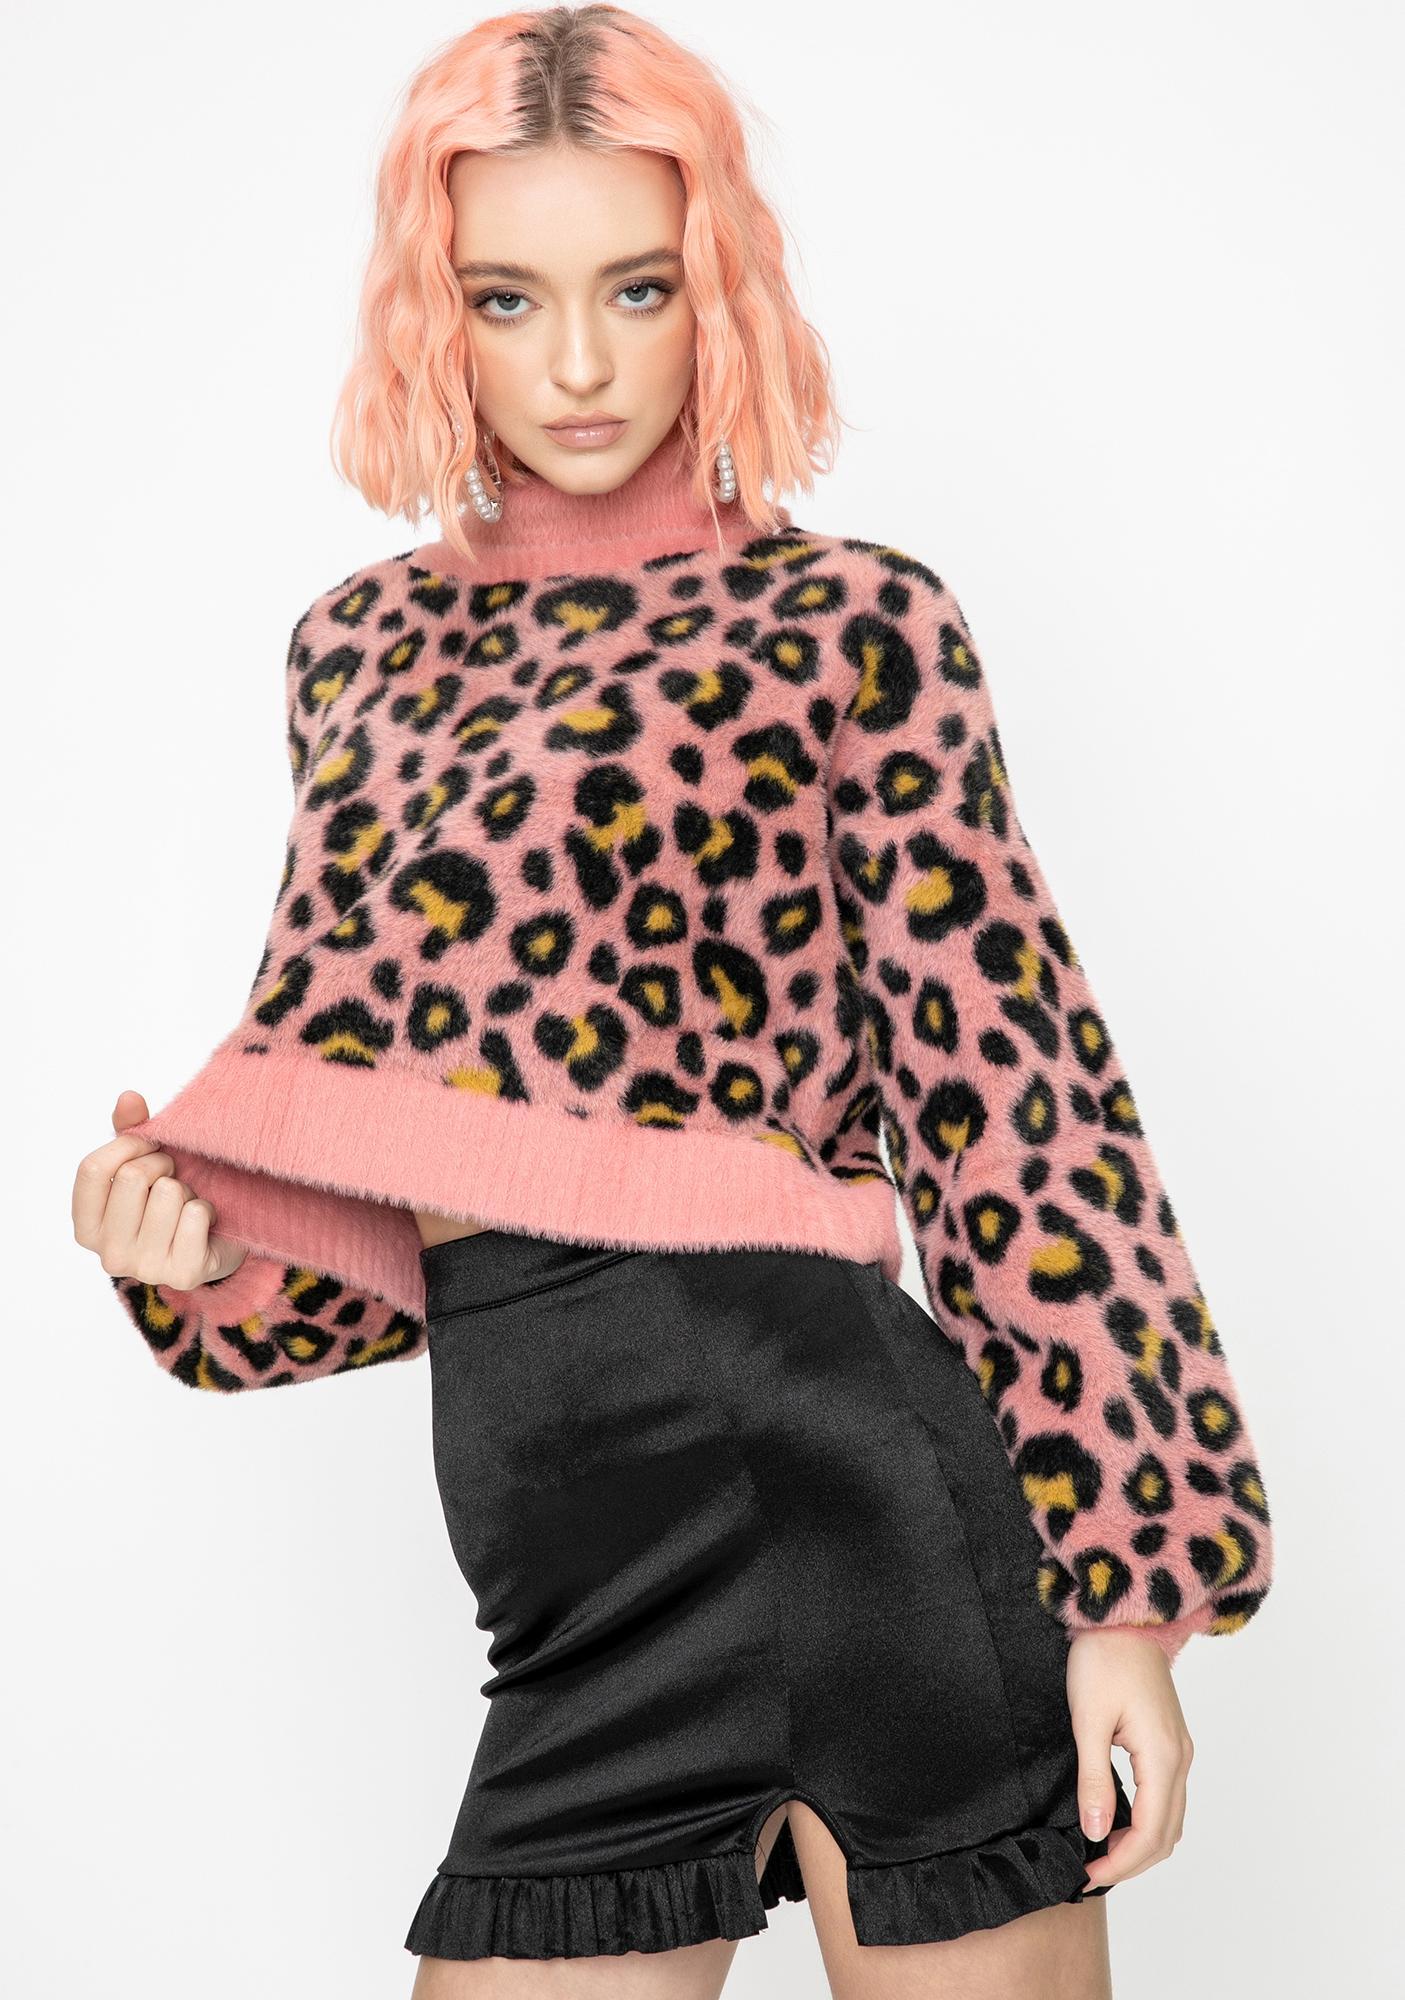 For Love & Lemons Angelina Leopard Turtleneck Sweater